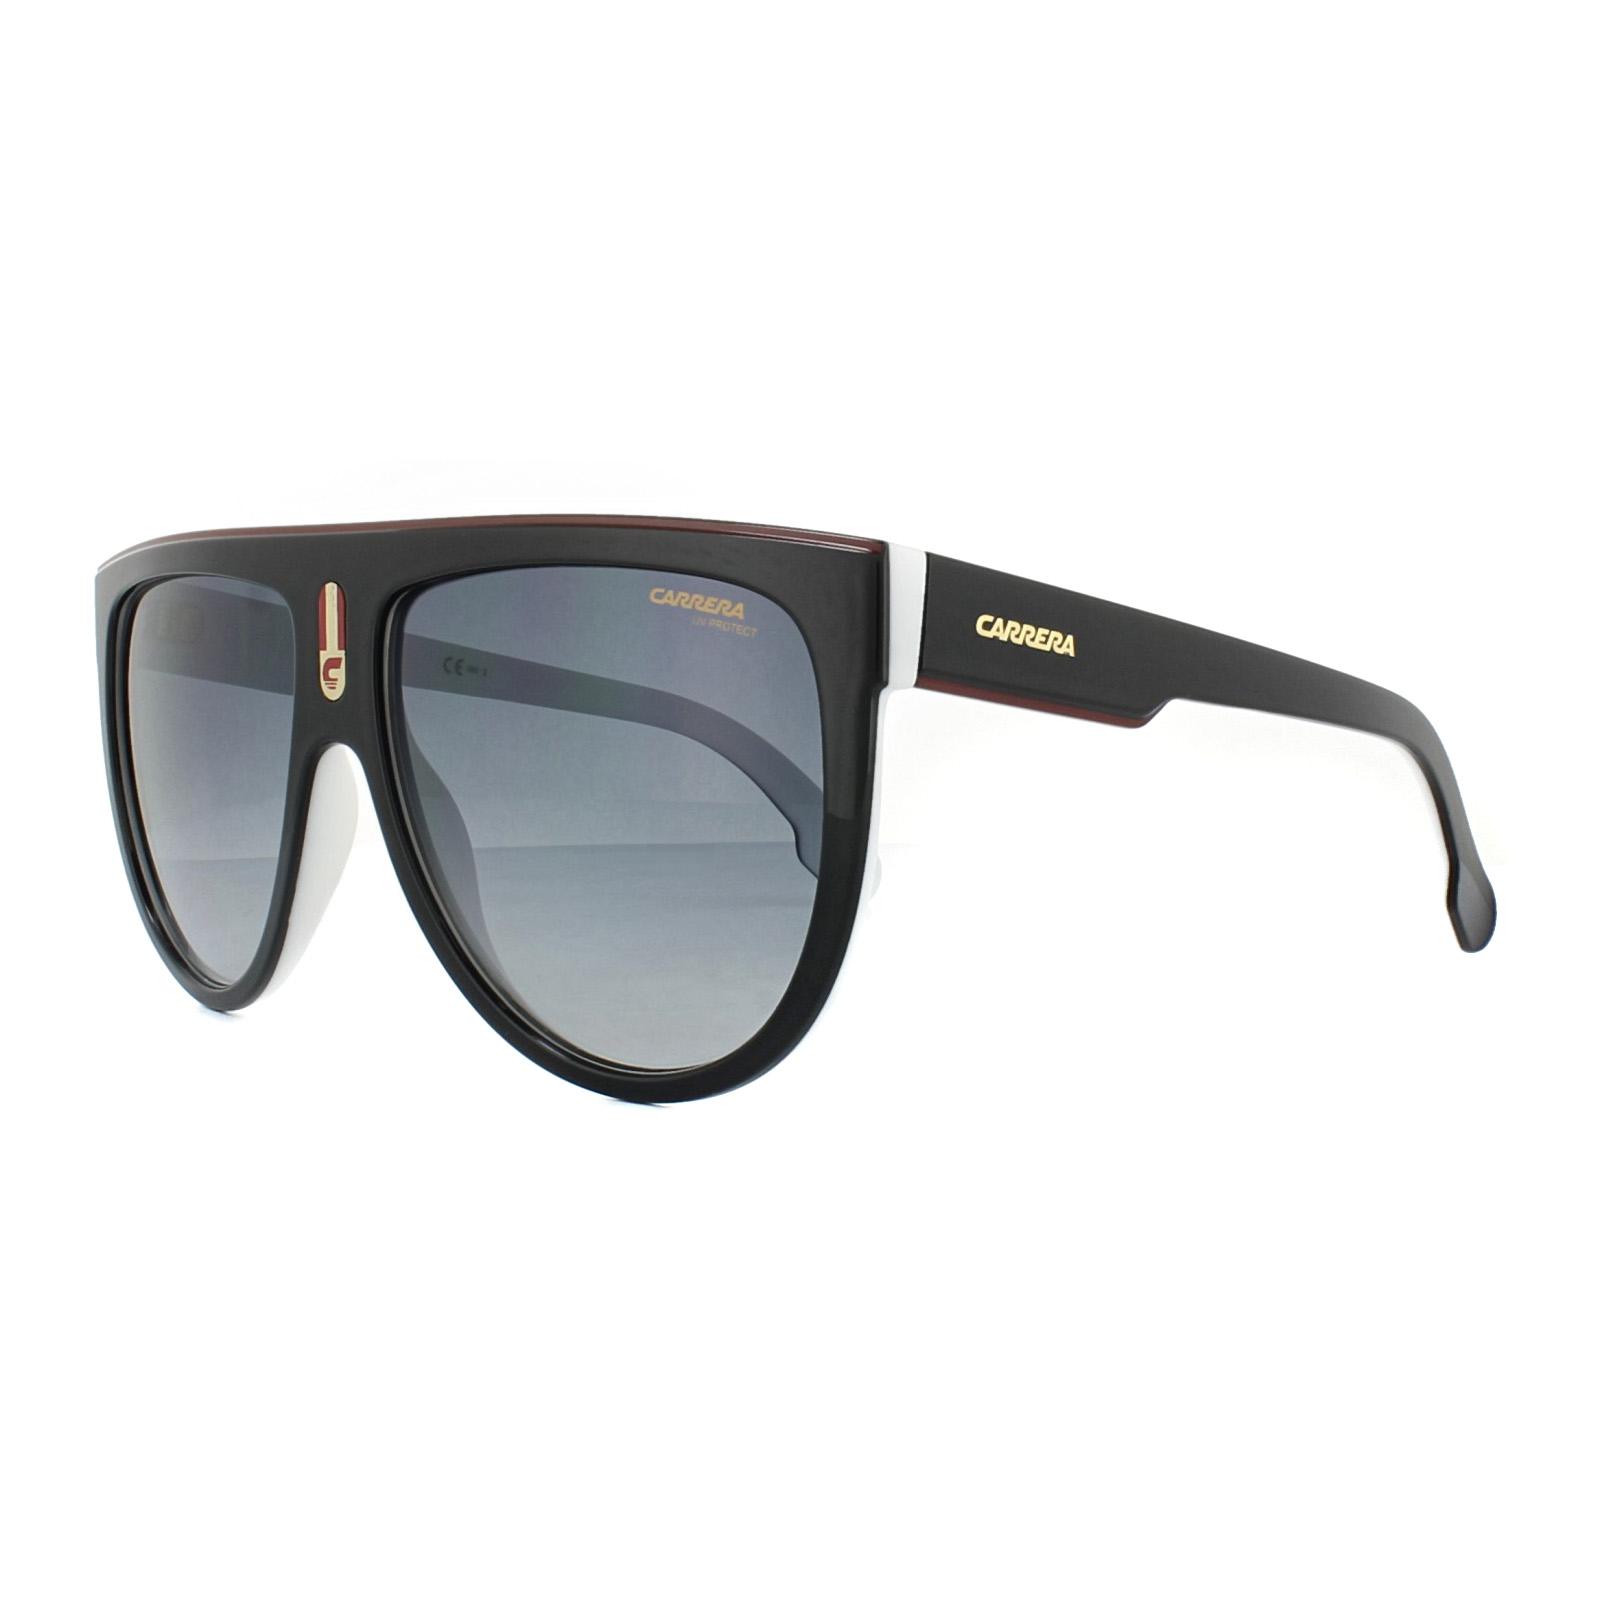 Sentinel Carrera Sunglasses Flagtop 80S 9O Black White Grey Gradient 42cfe827b8bf